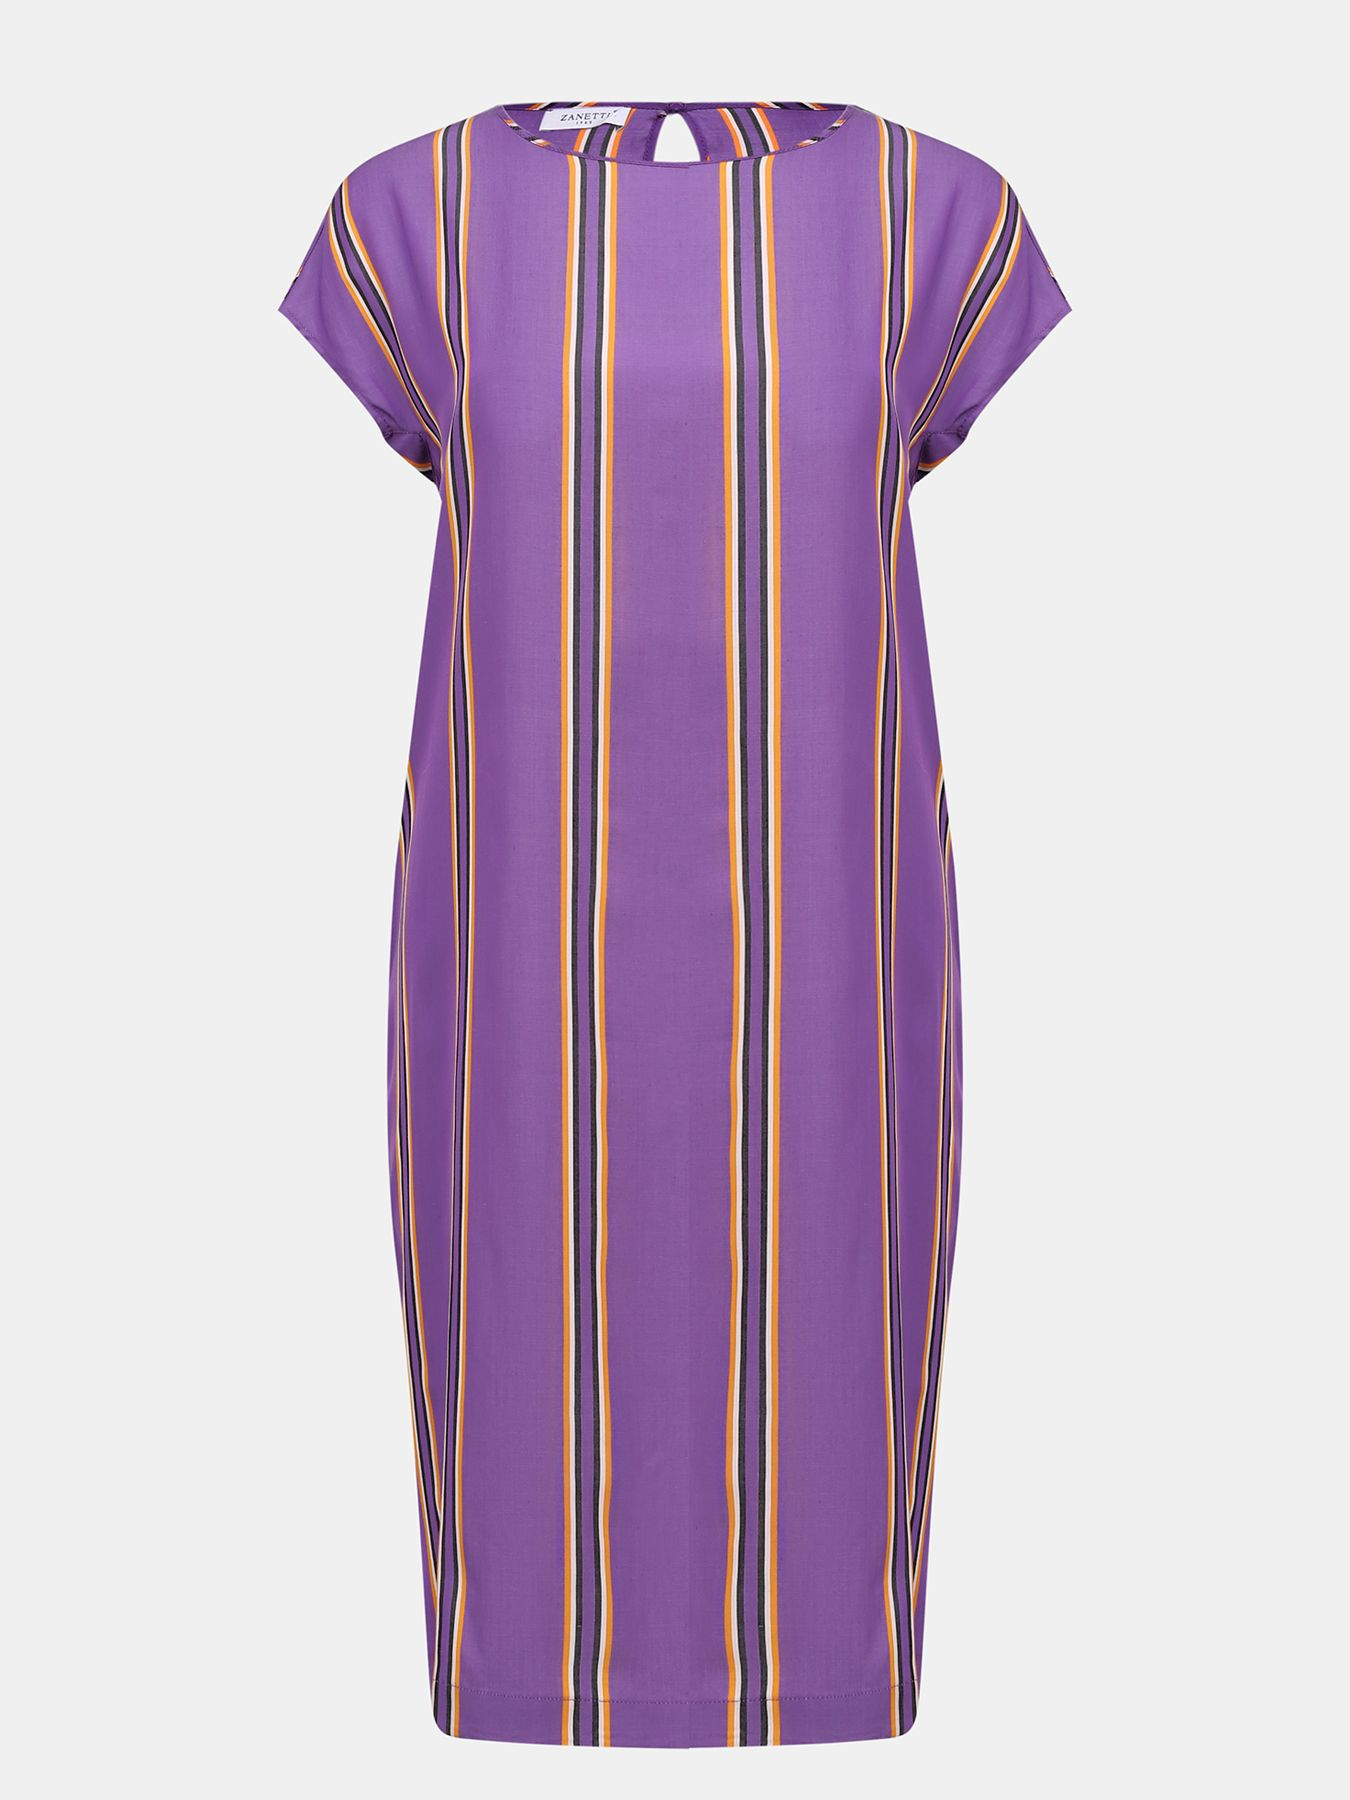 Платья Zanetti Платье платья rinascimento платье